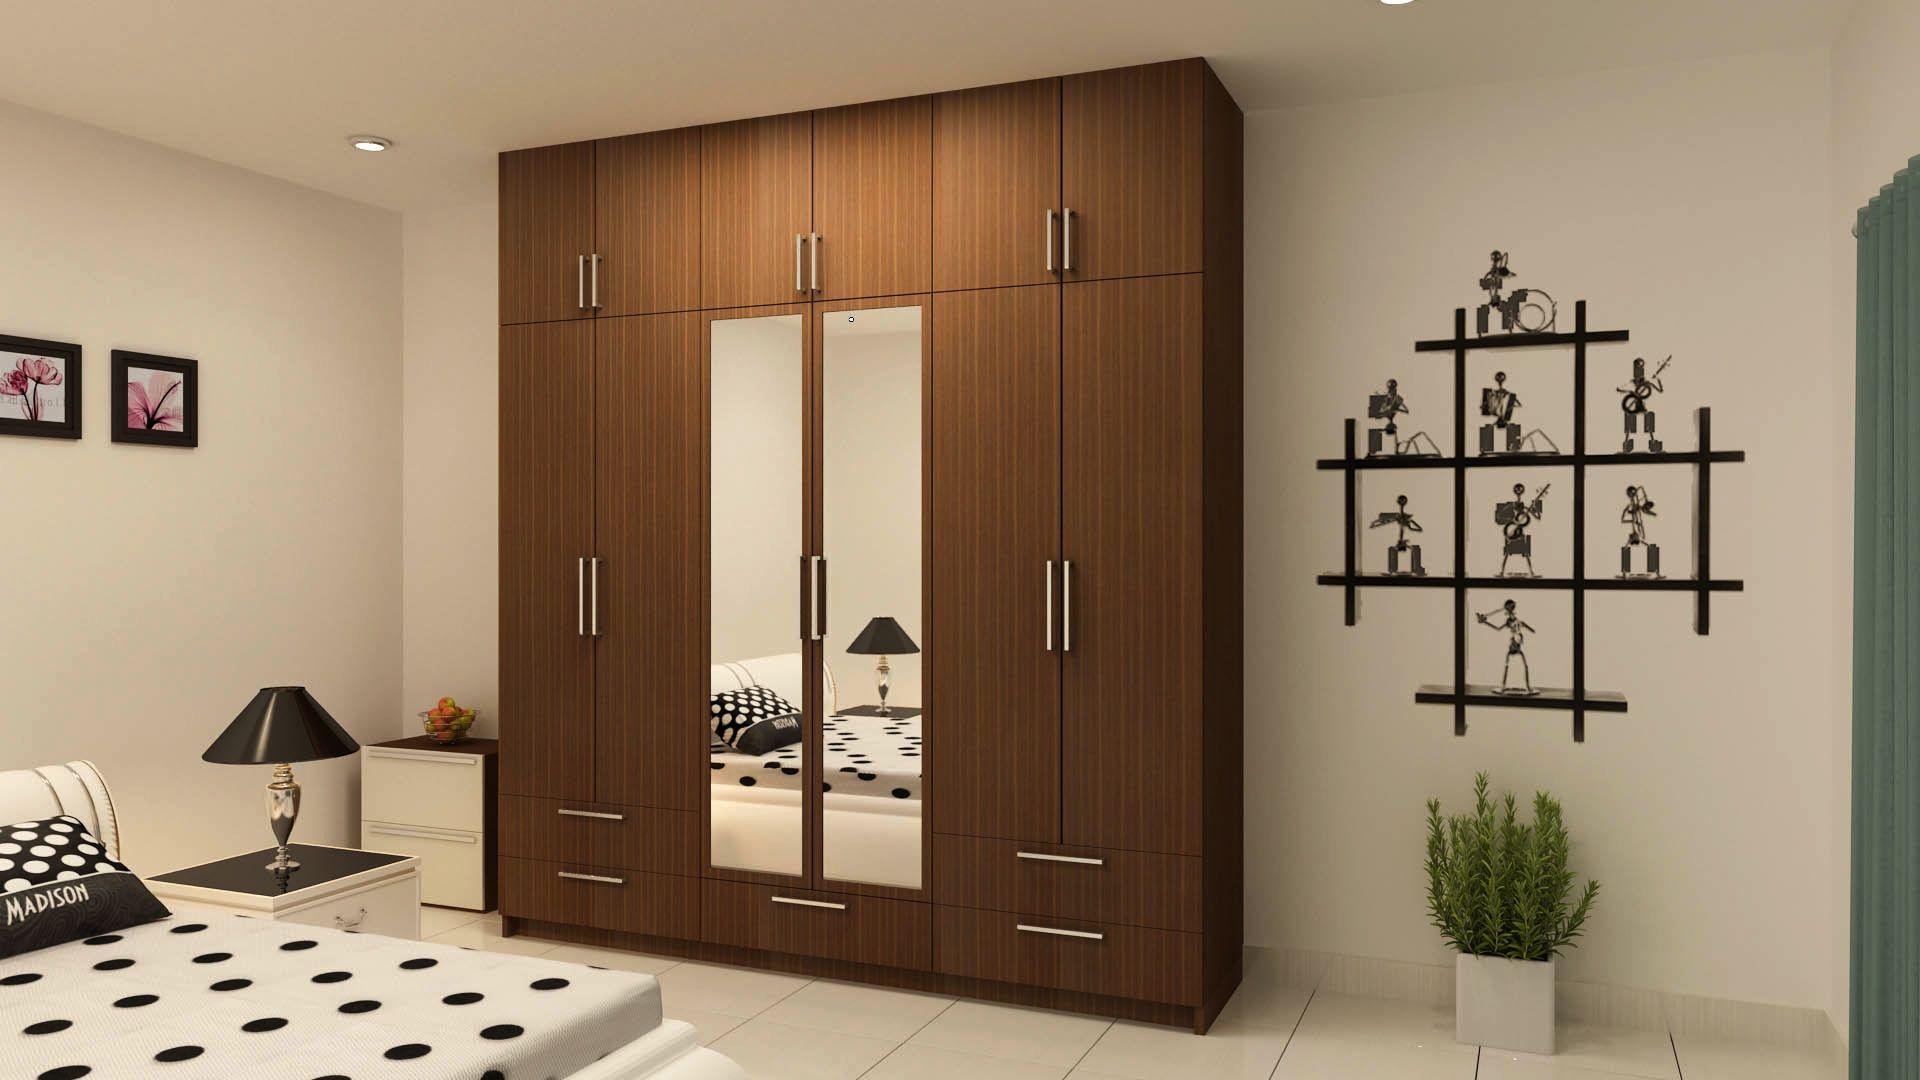 Stylish Modern Wardrobe Designs For Bedroom Wardrobe Design Bedroom Bedroom Closet Design Wadrobe Design